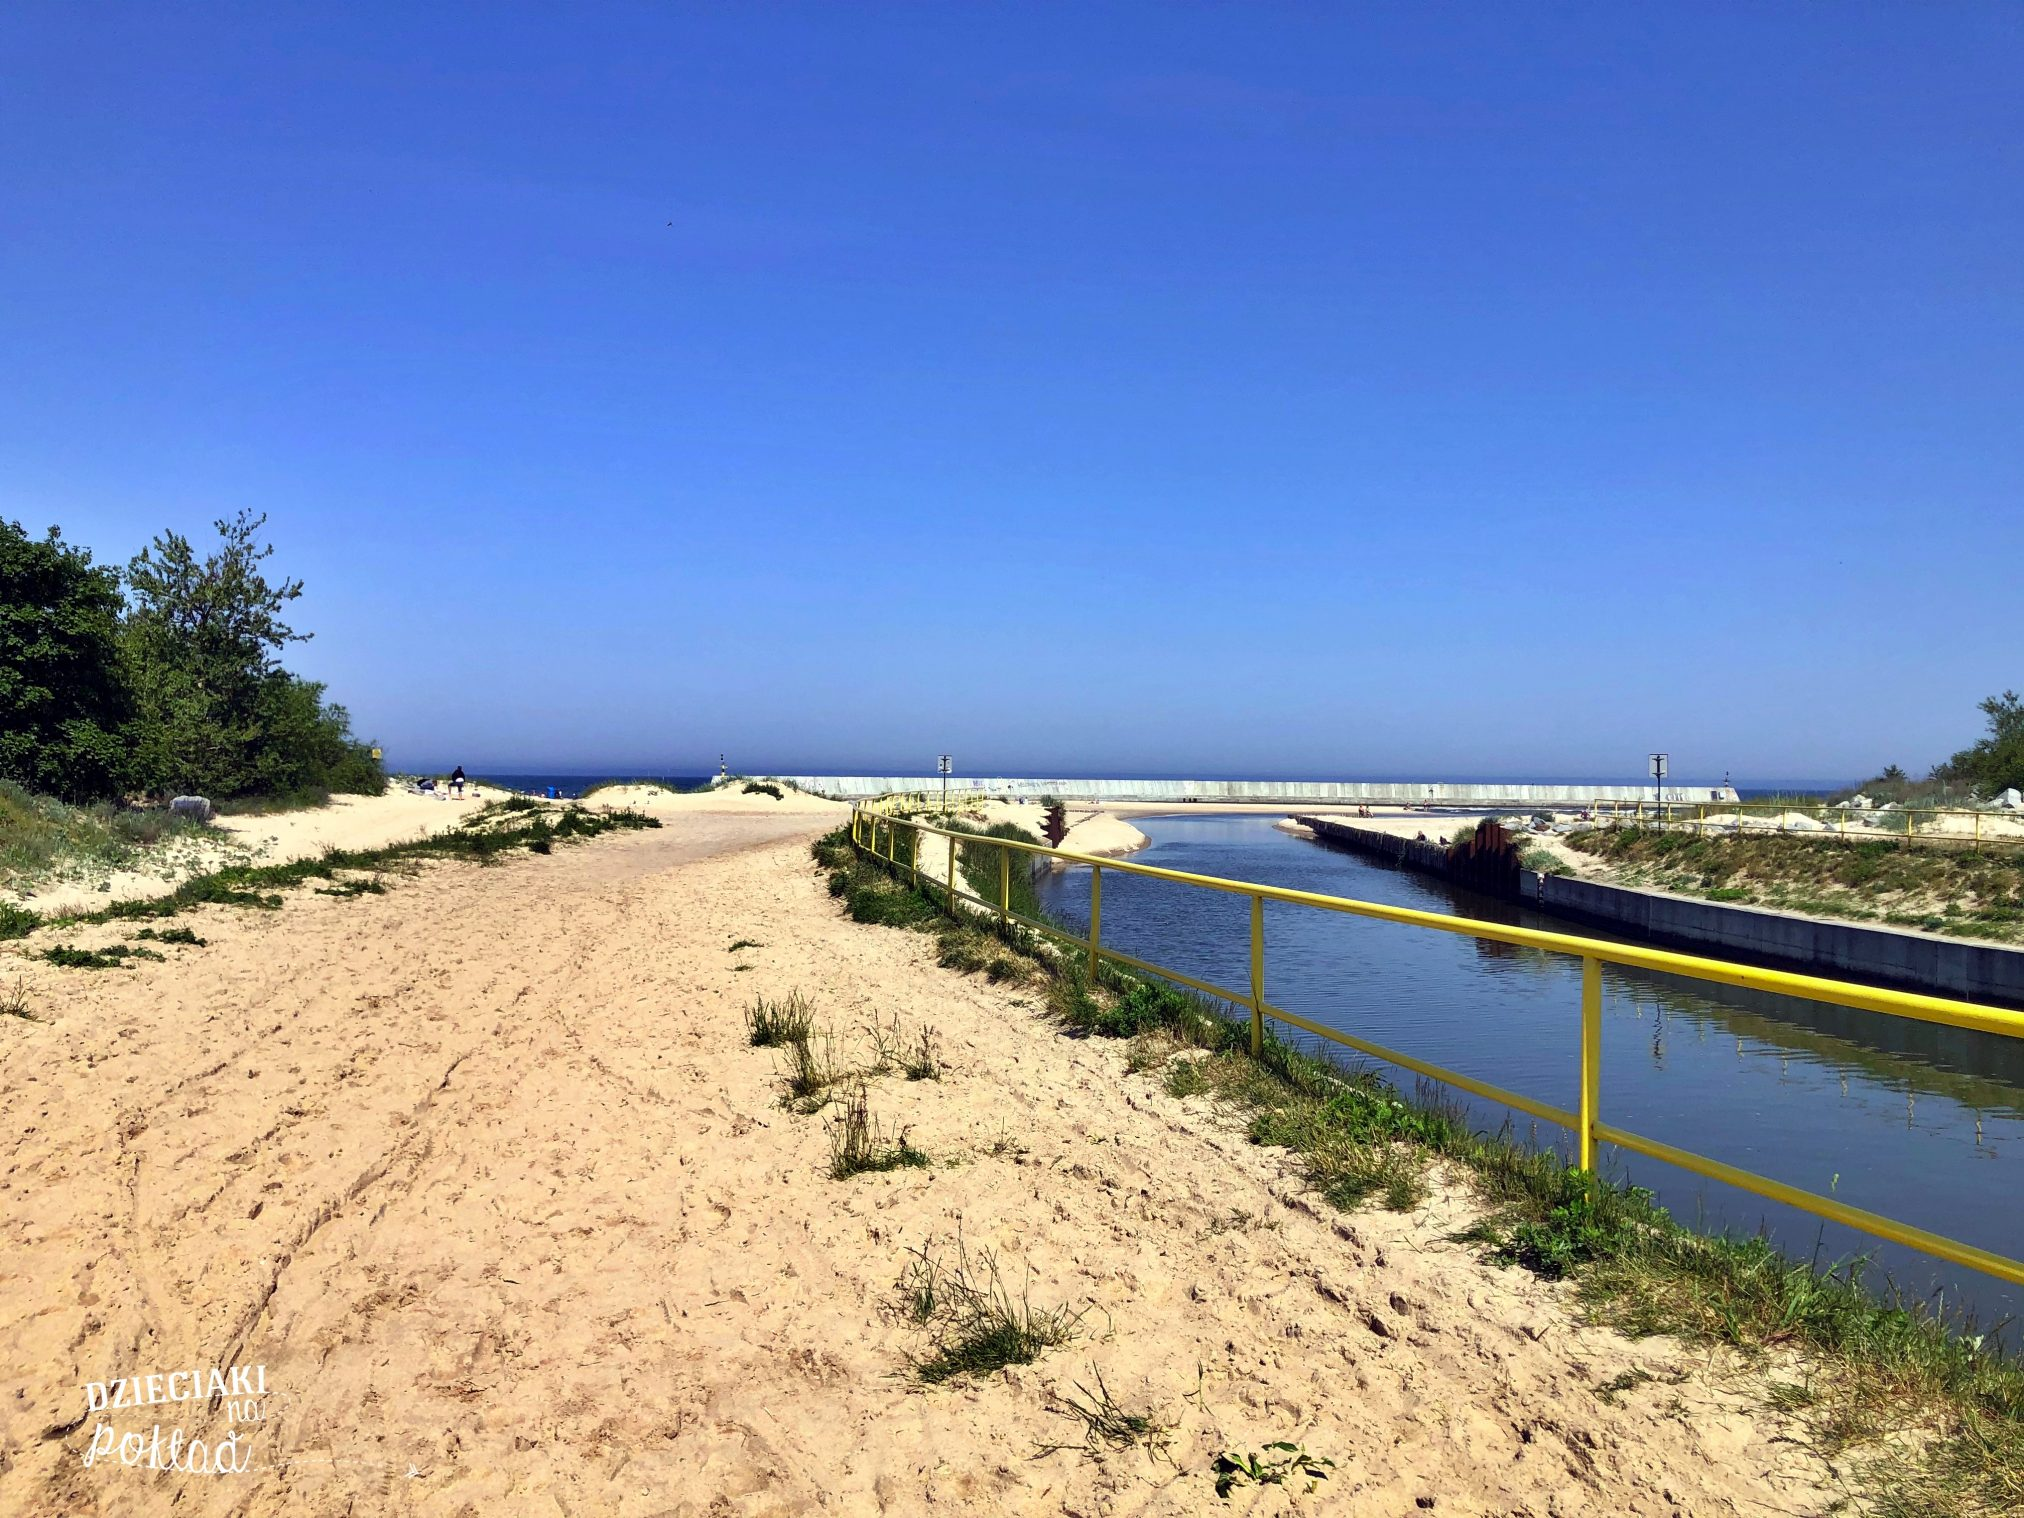 nad polskim morzem - Kanał Jamneński